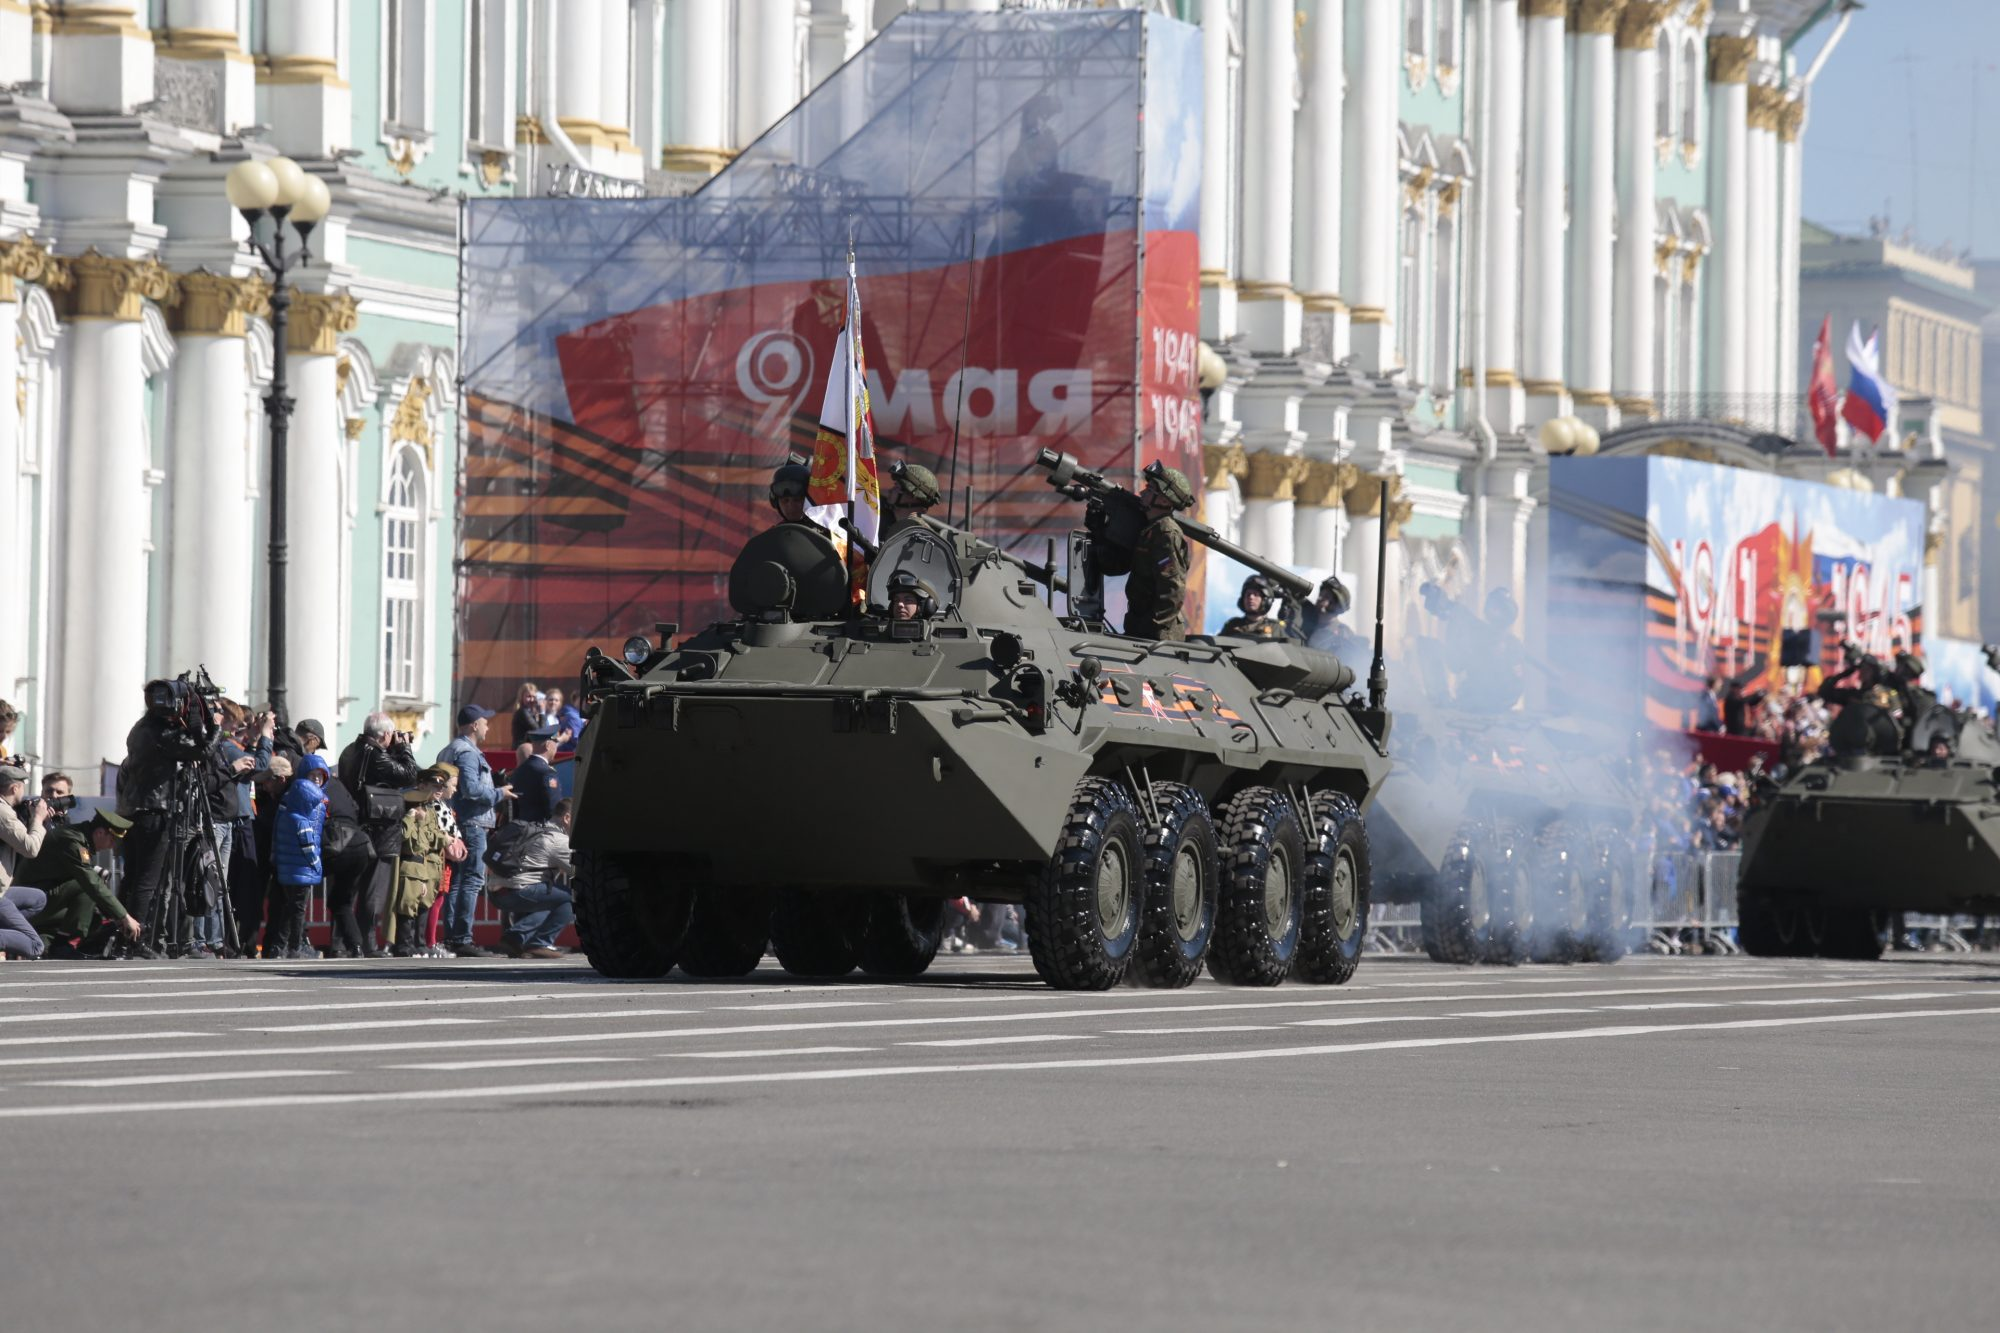 _MG_1949 день победы парад дворцовая танк